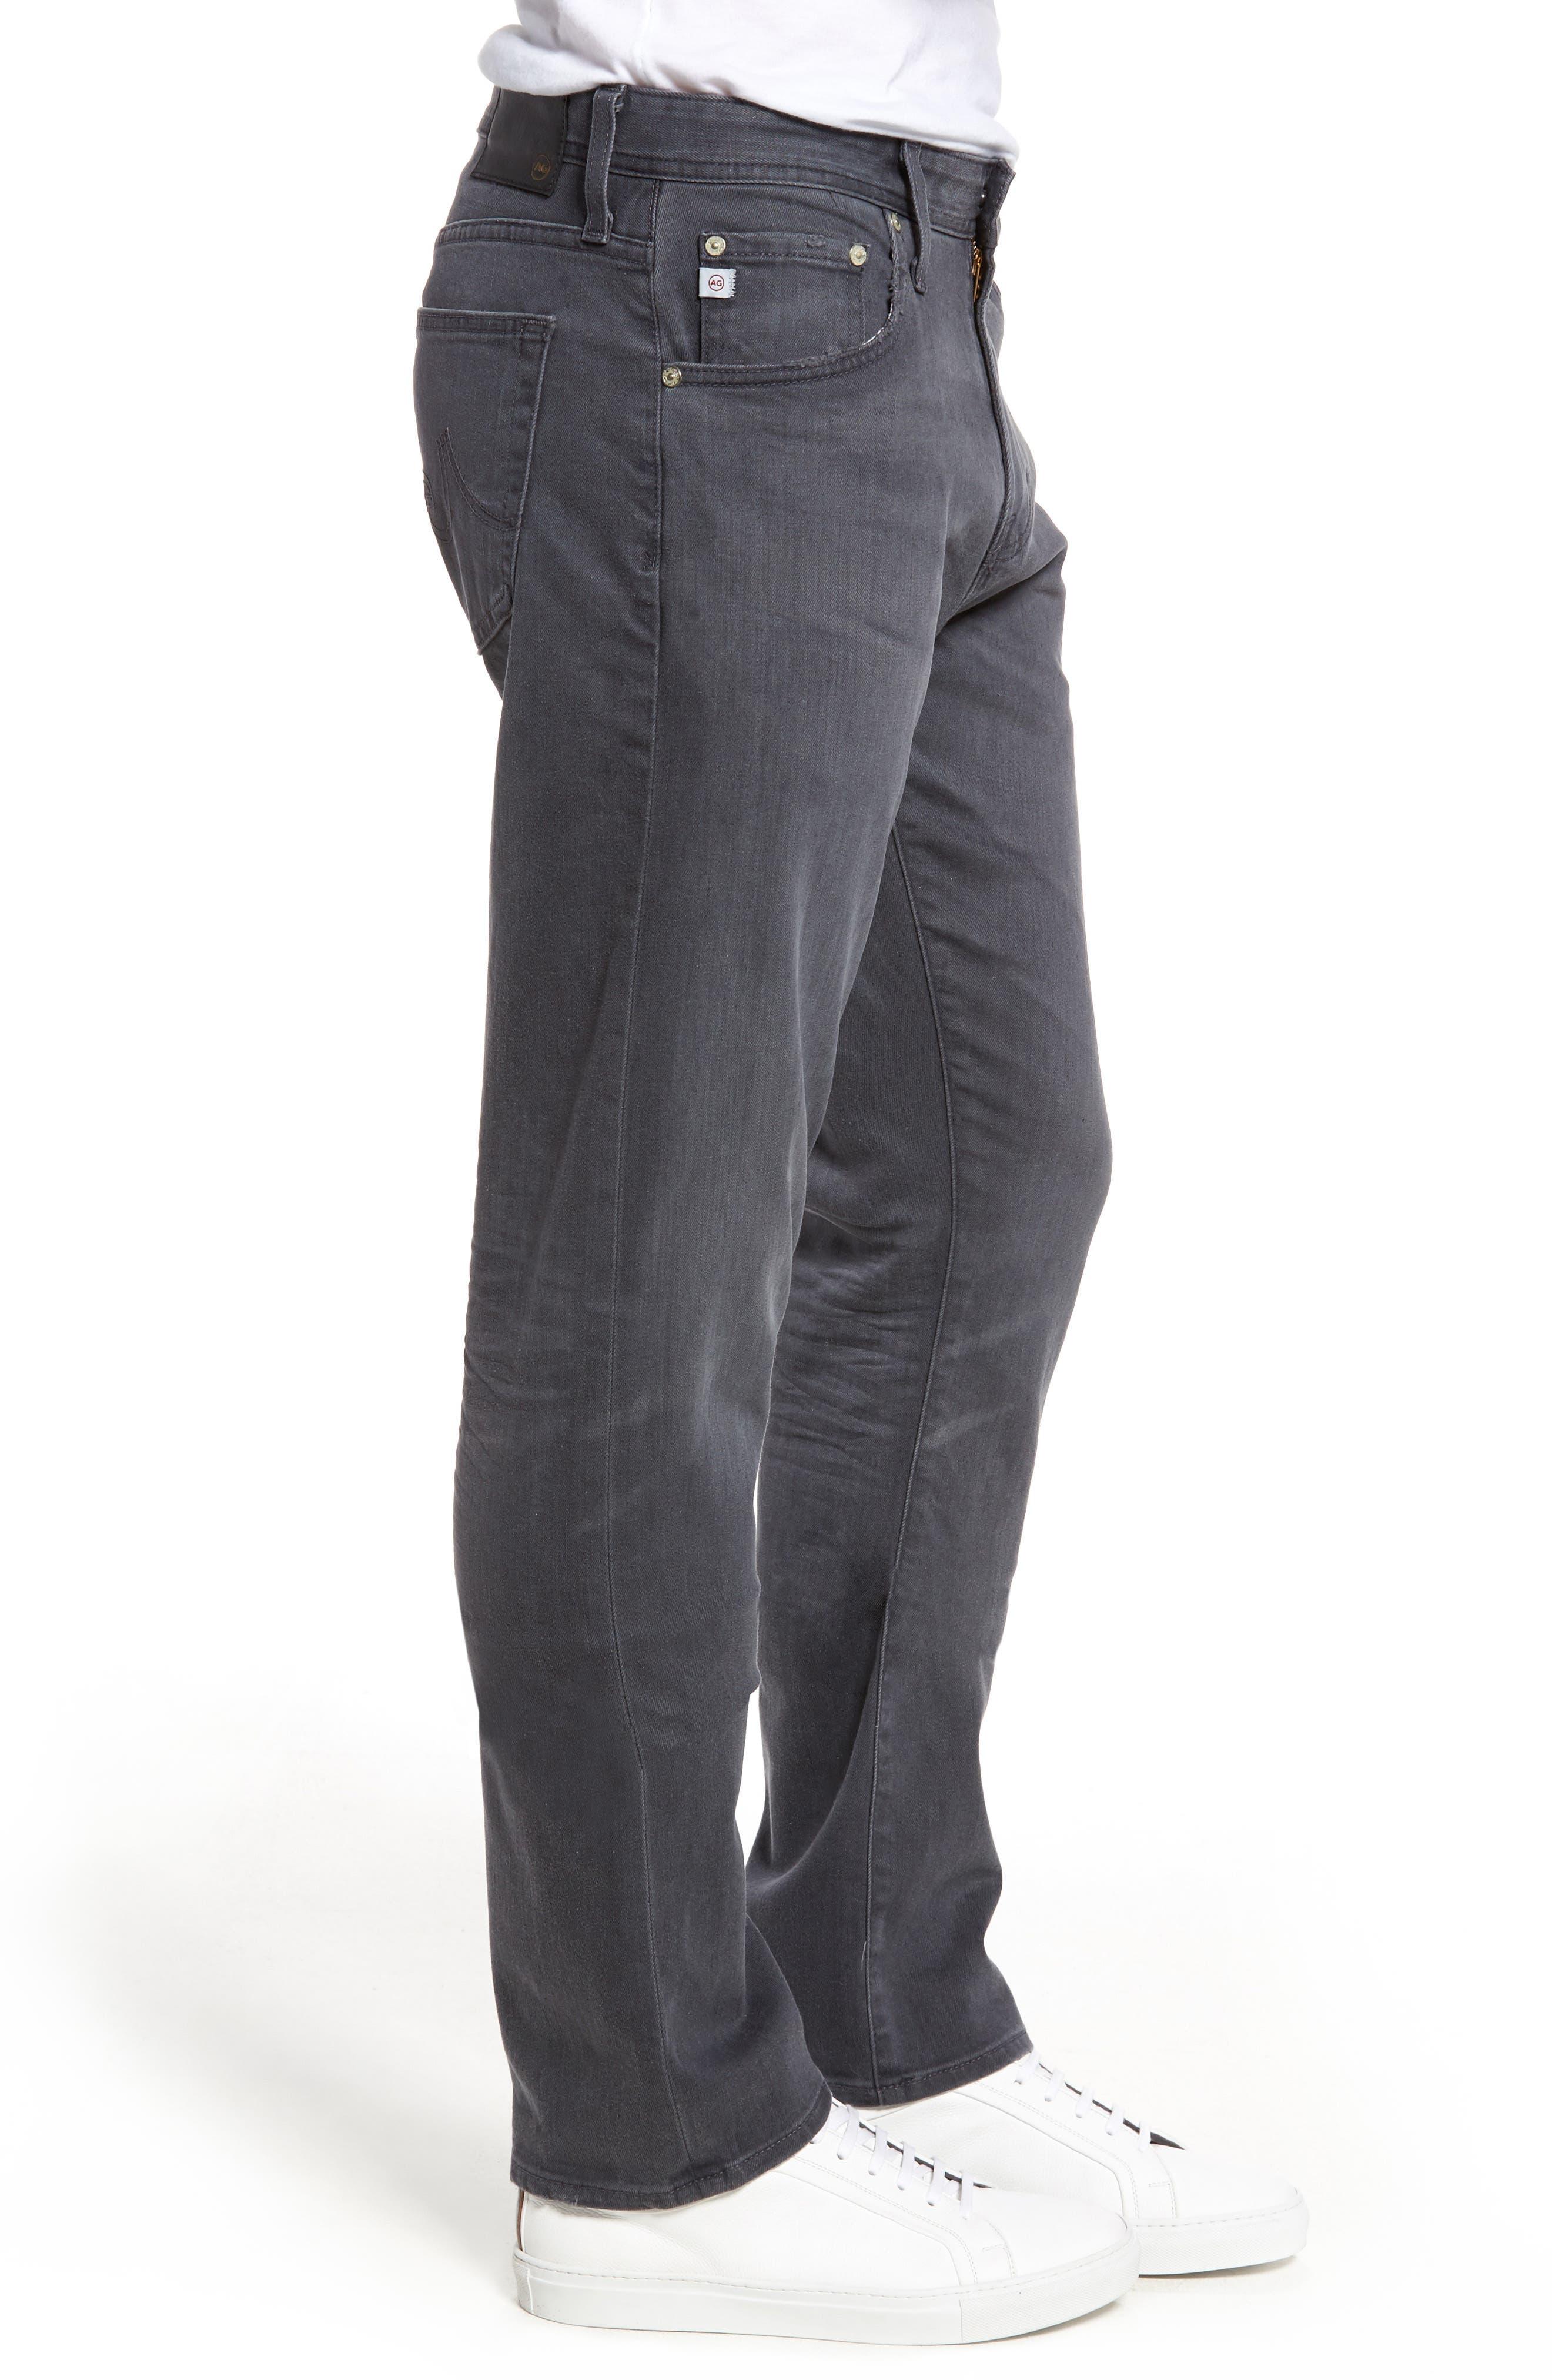 Ives Straight Leg Jeans,                             Alternate thumbnail 3, color,                             020